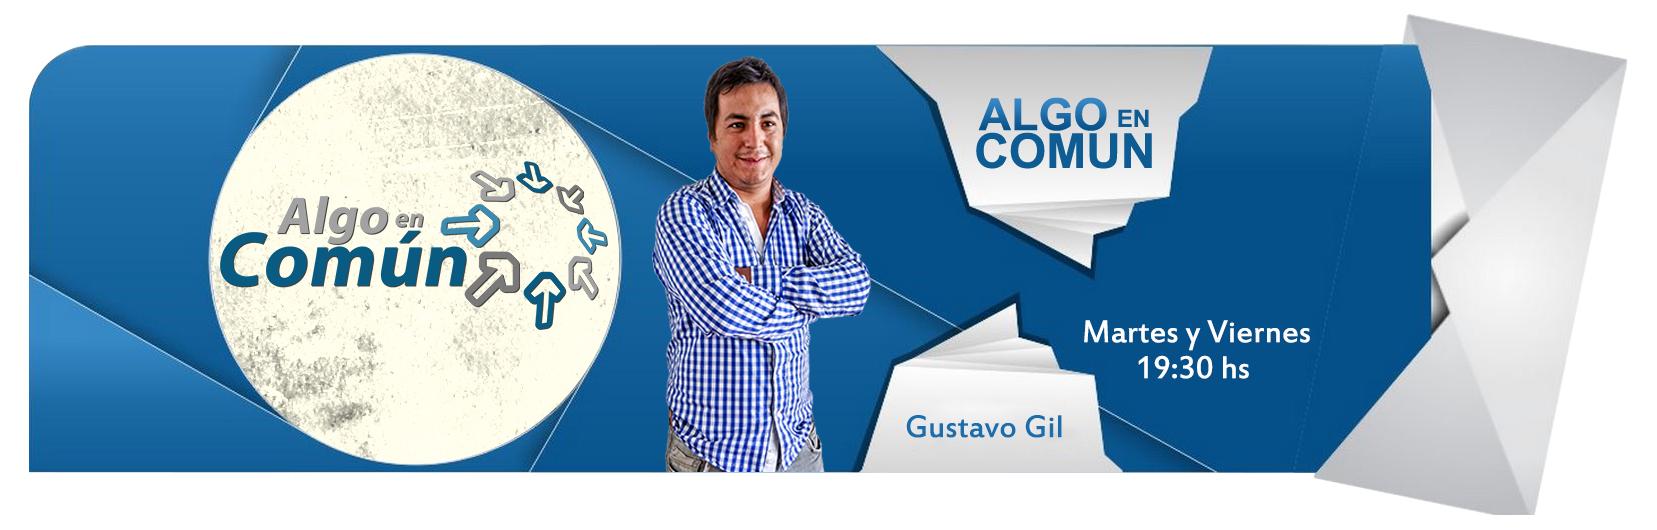 Flyer-Algo-en-Comunraster